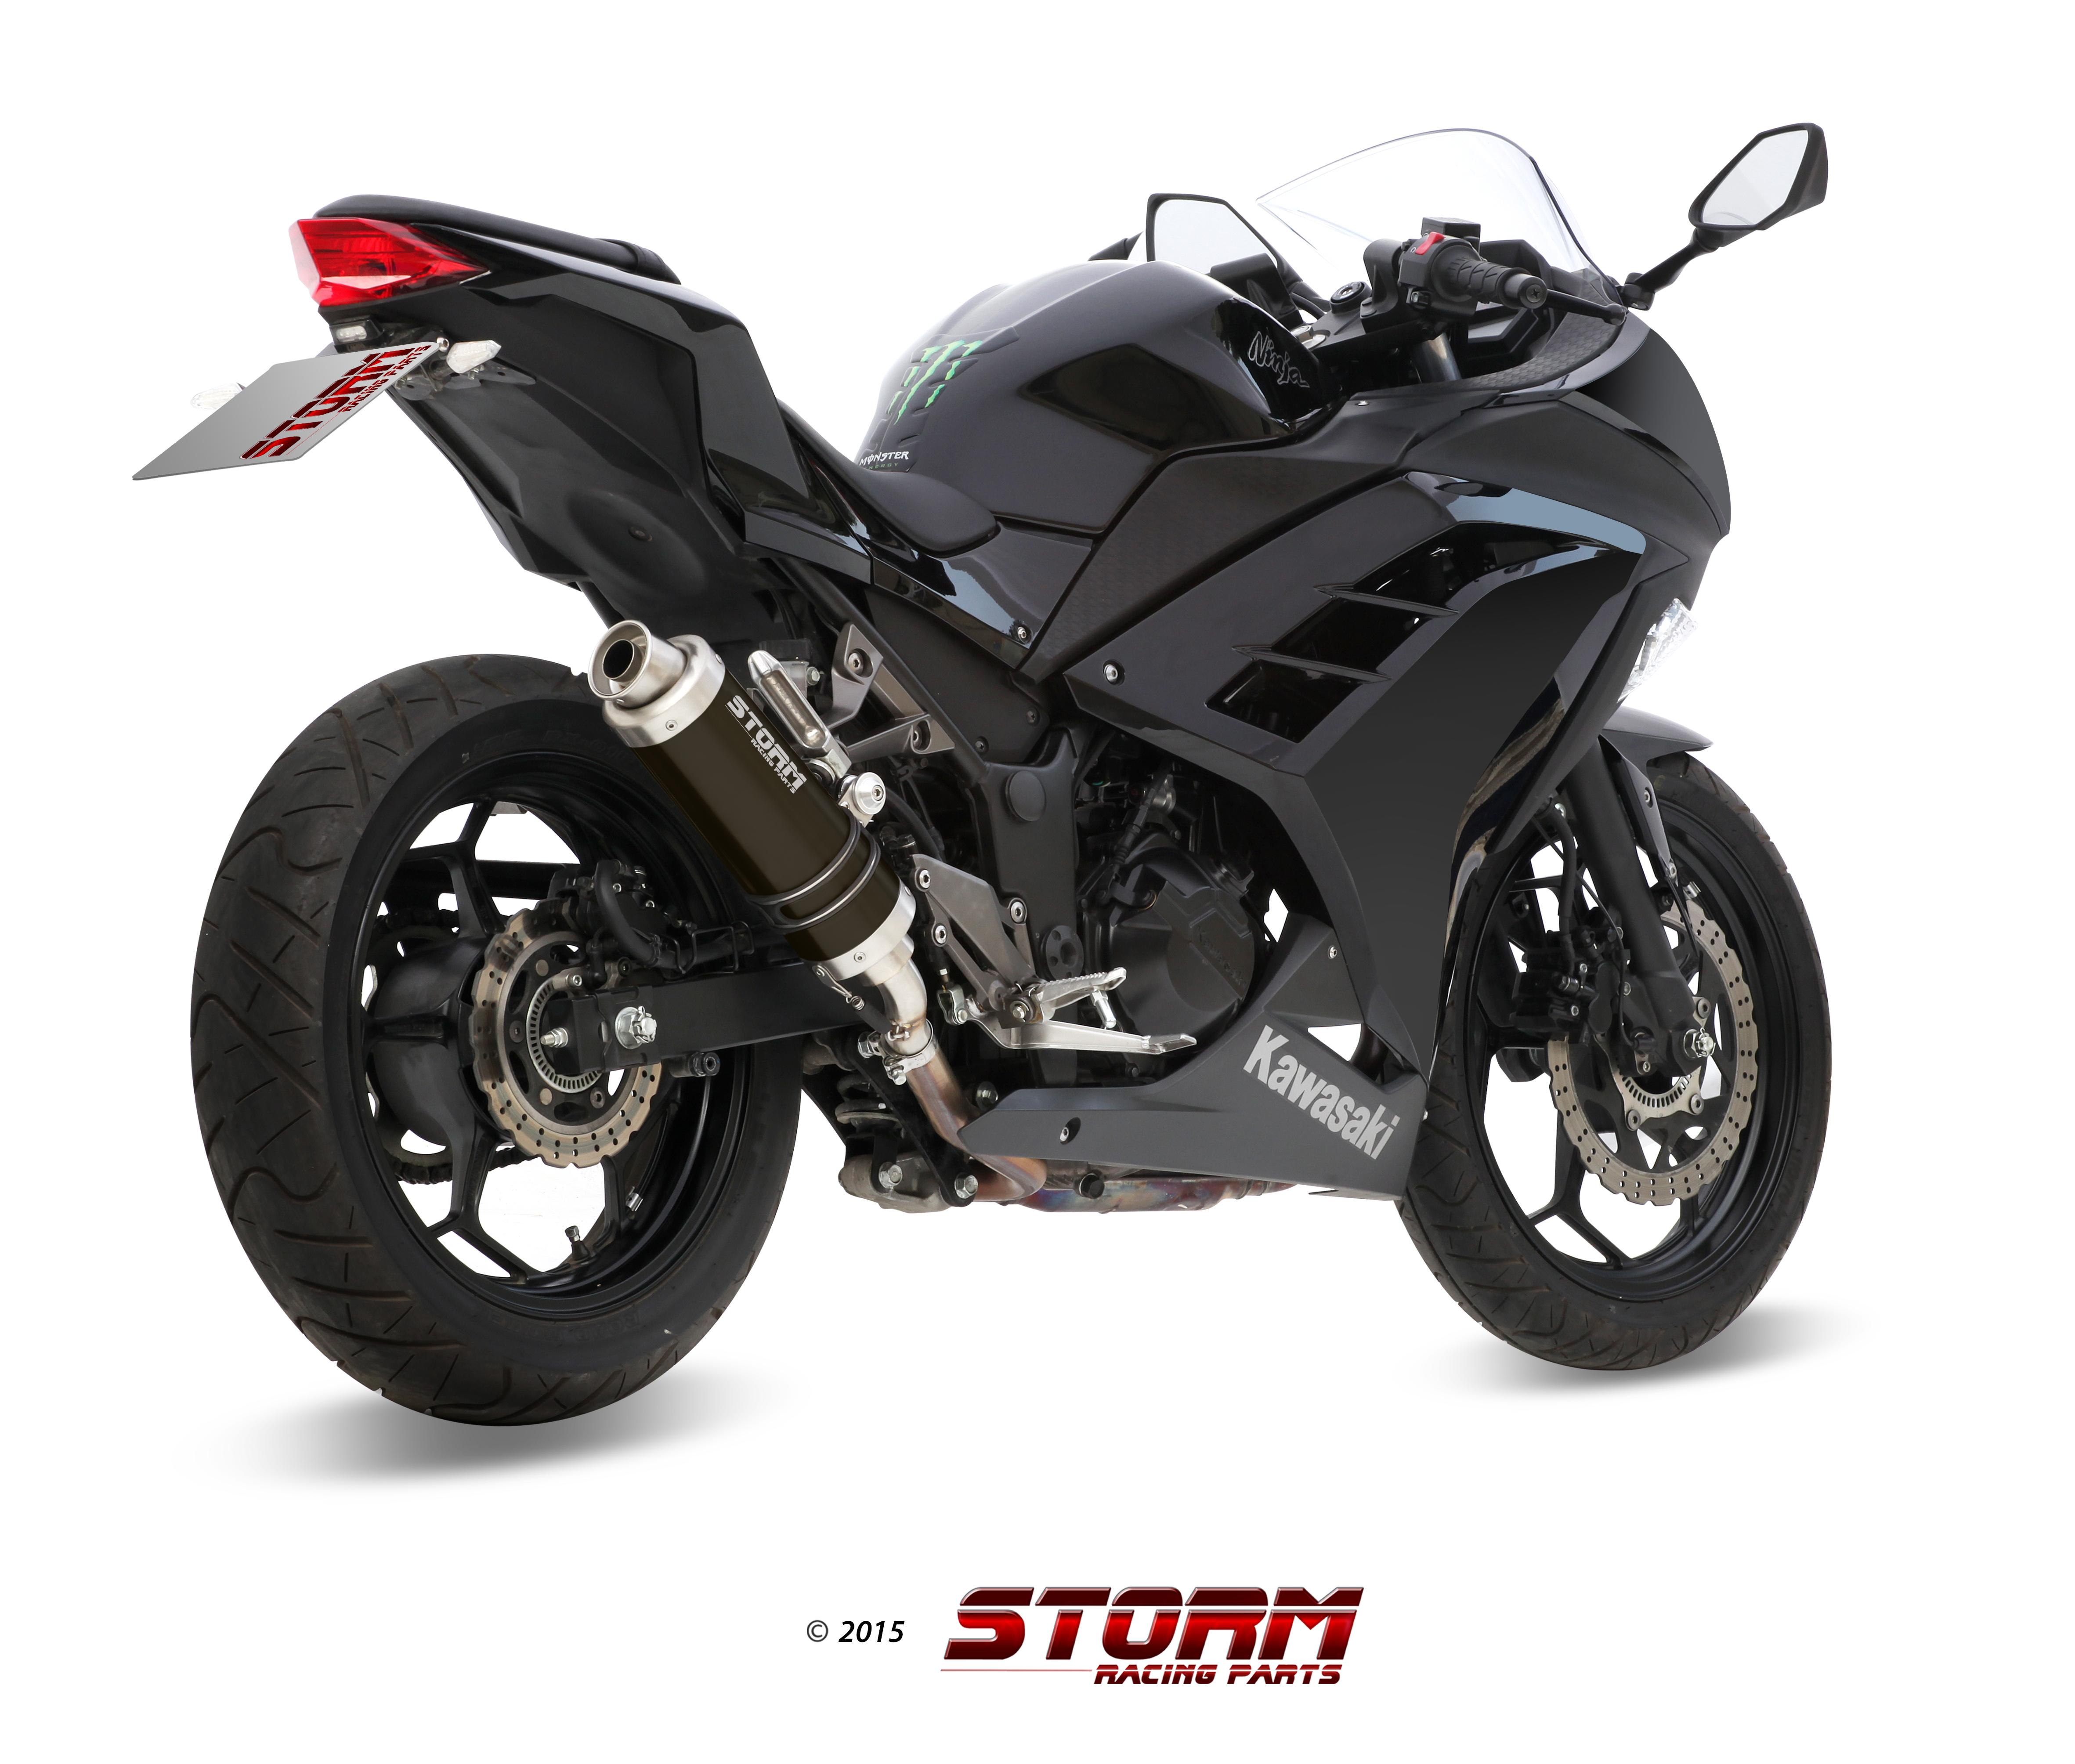 KAWASAKI NINJA 300 Exhaust Storm Gp Black stainless steel K.038.LXSB